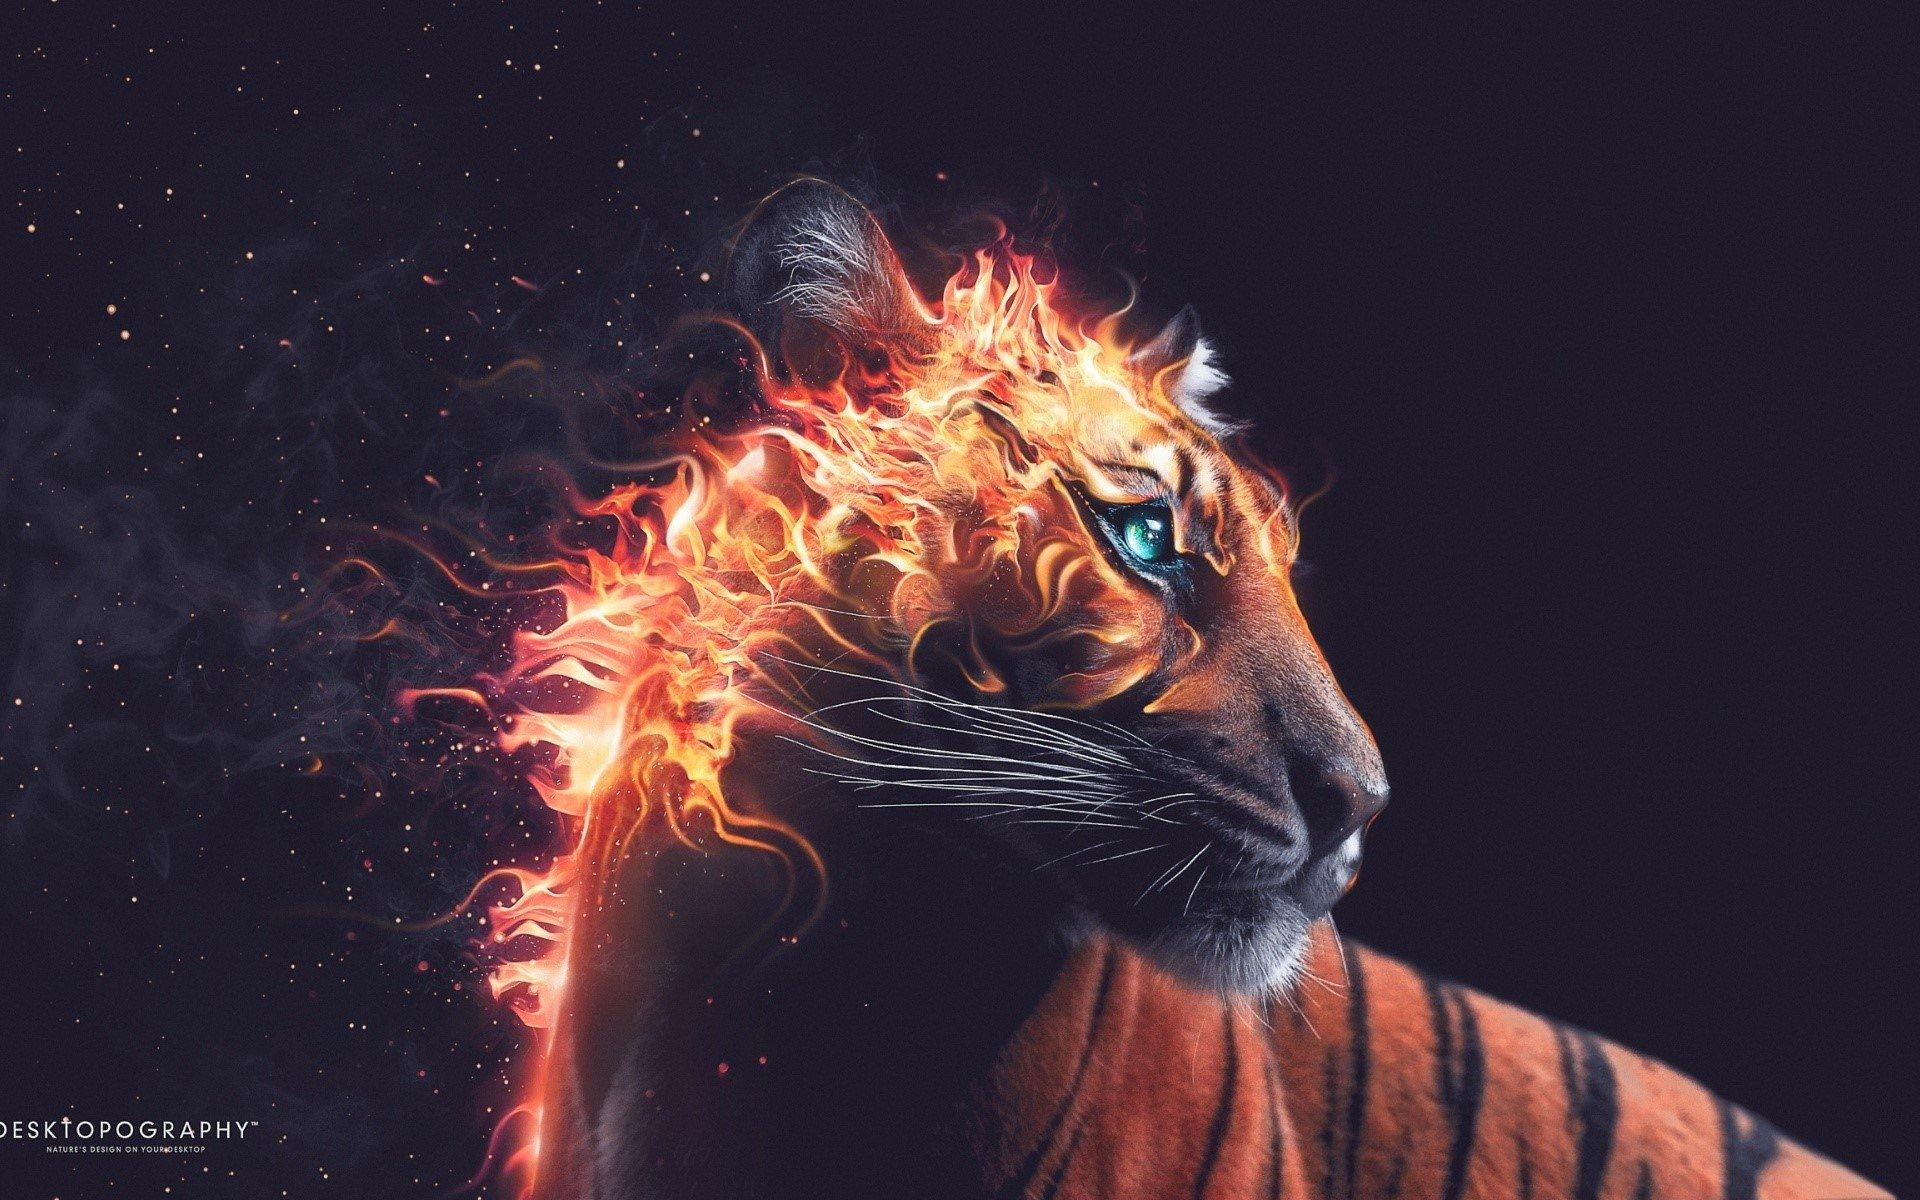 Fondos de pantalla Tigre de fuego